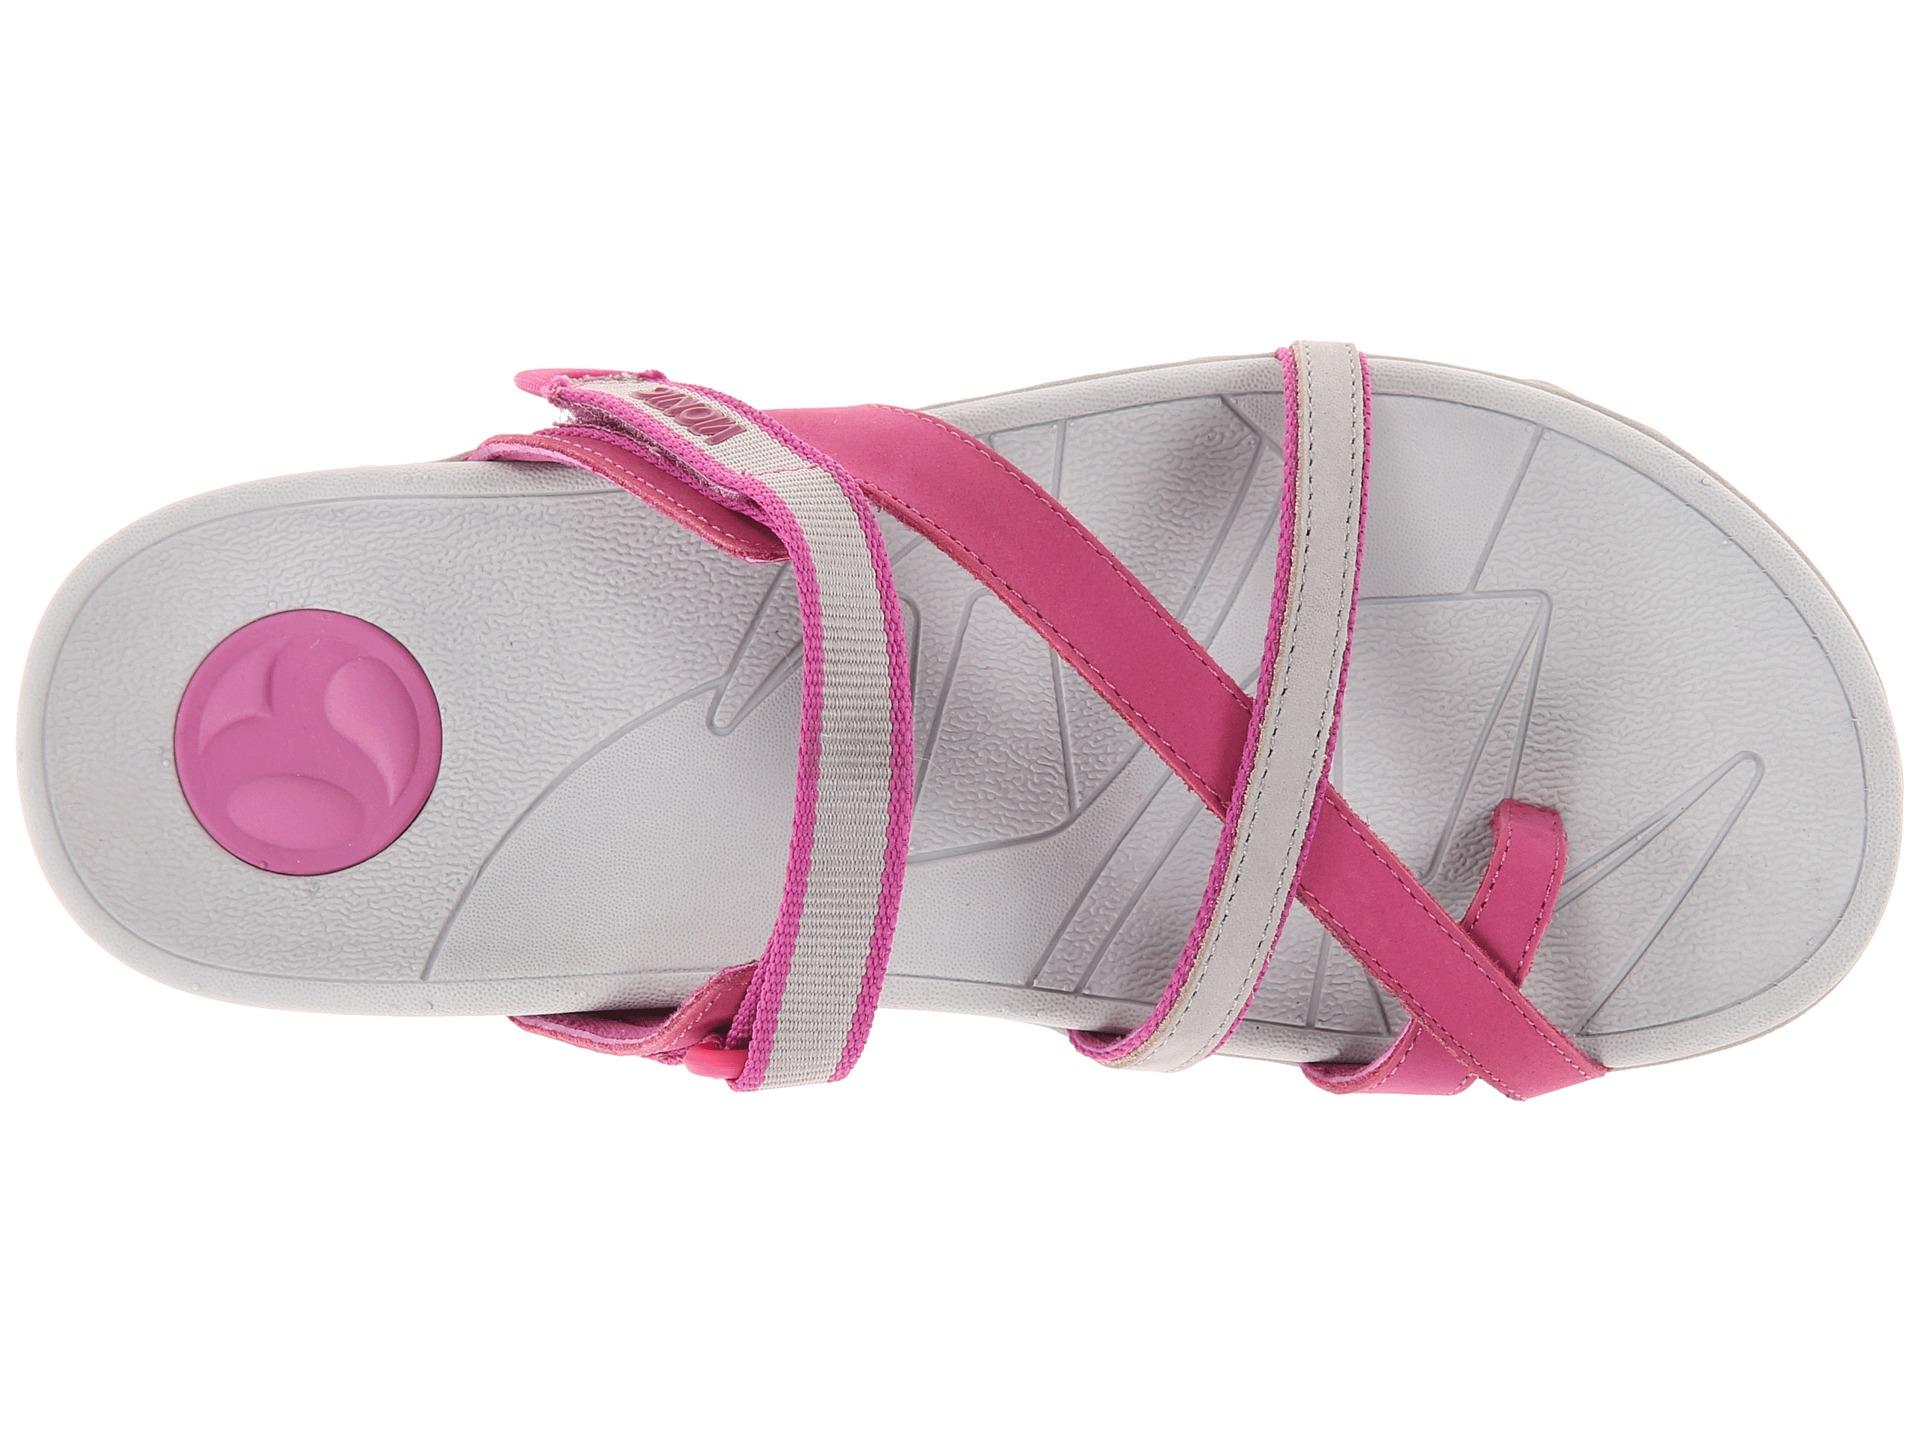 Vionic Mojave Sport Recovery Toepost Sandal In Purple Lyst